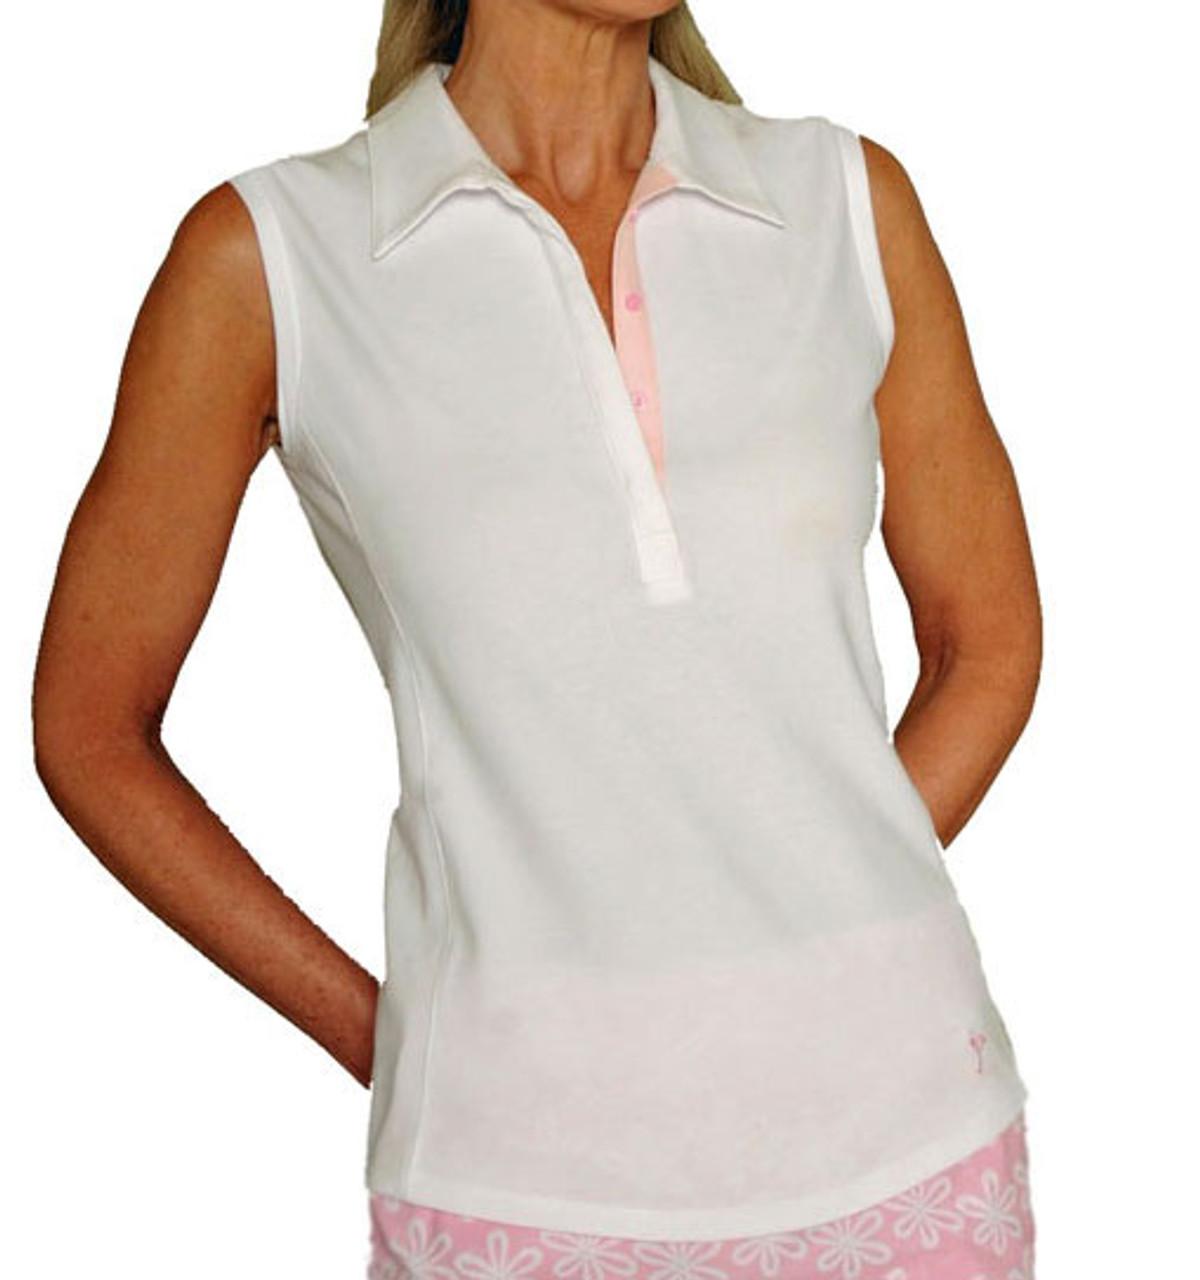 b4dc4f2f8 Golftini Cotton White Ladies Sleeveless Golf Polo Shirt with Light ...